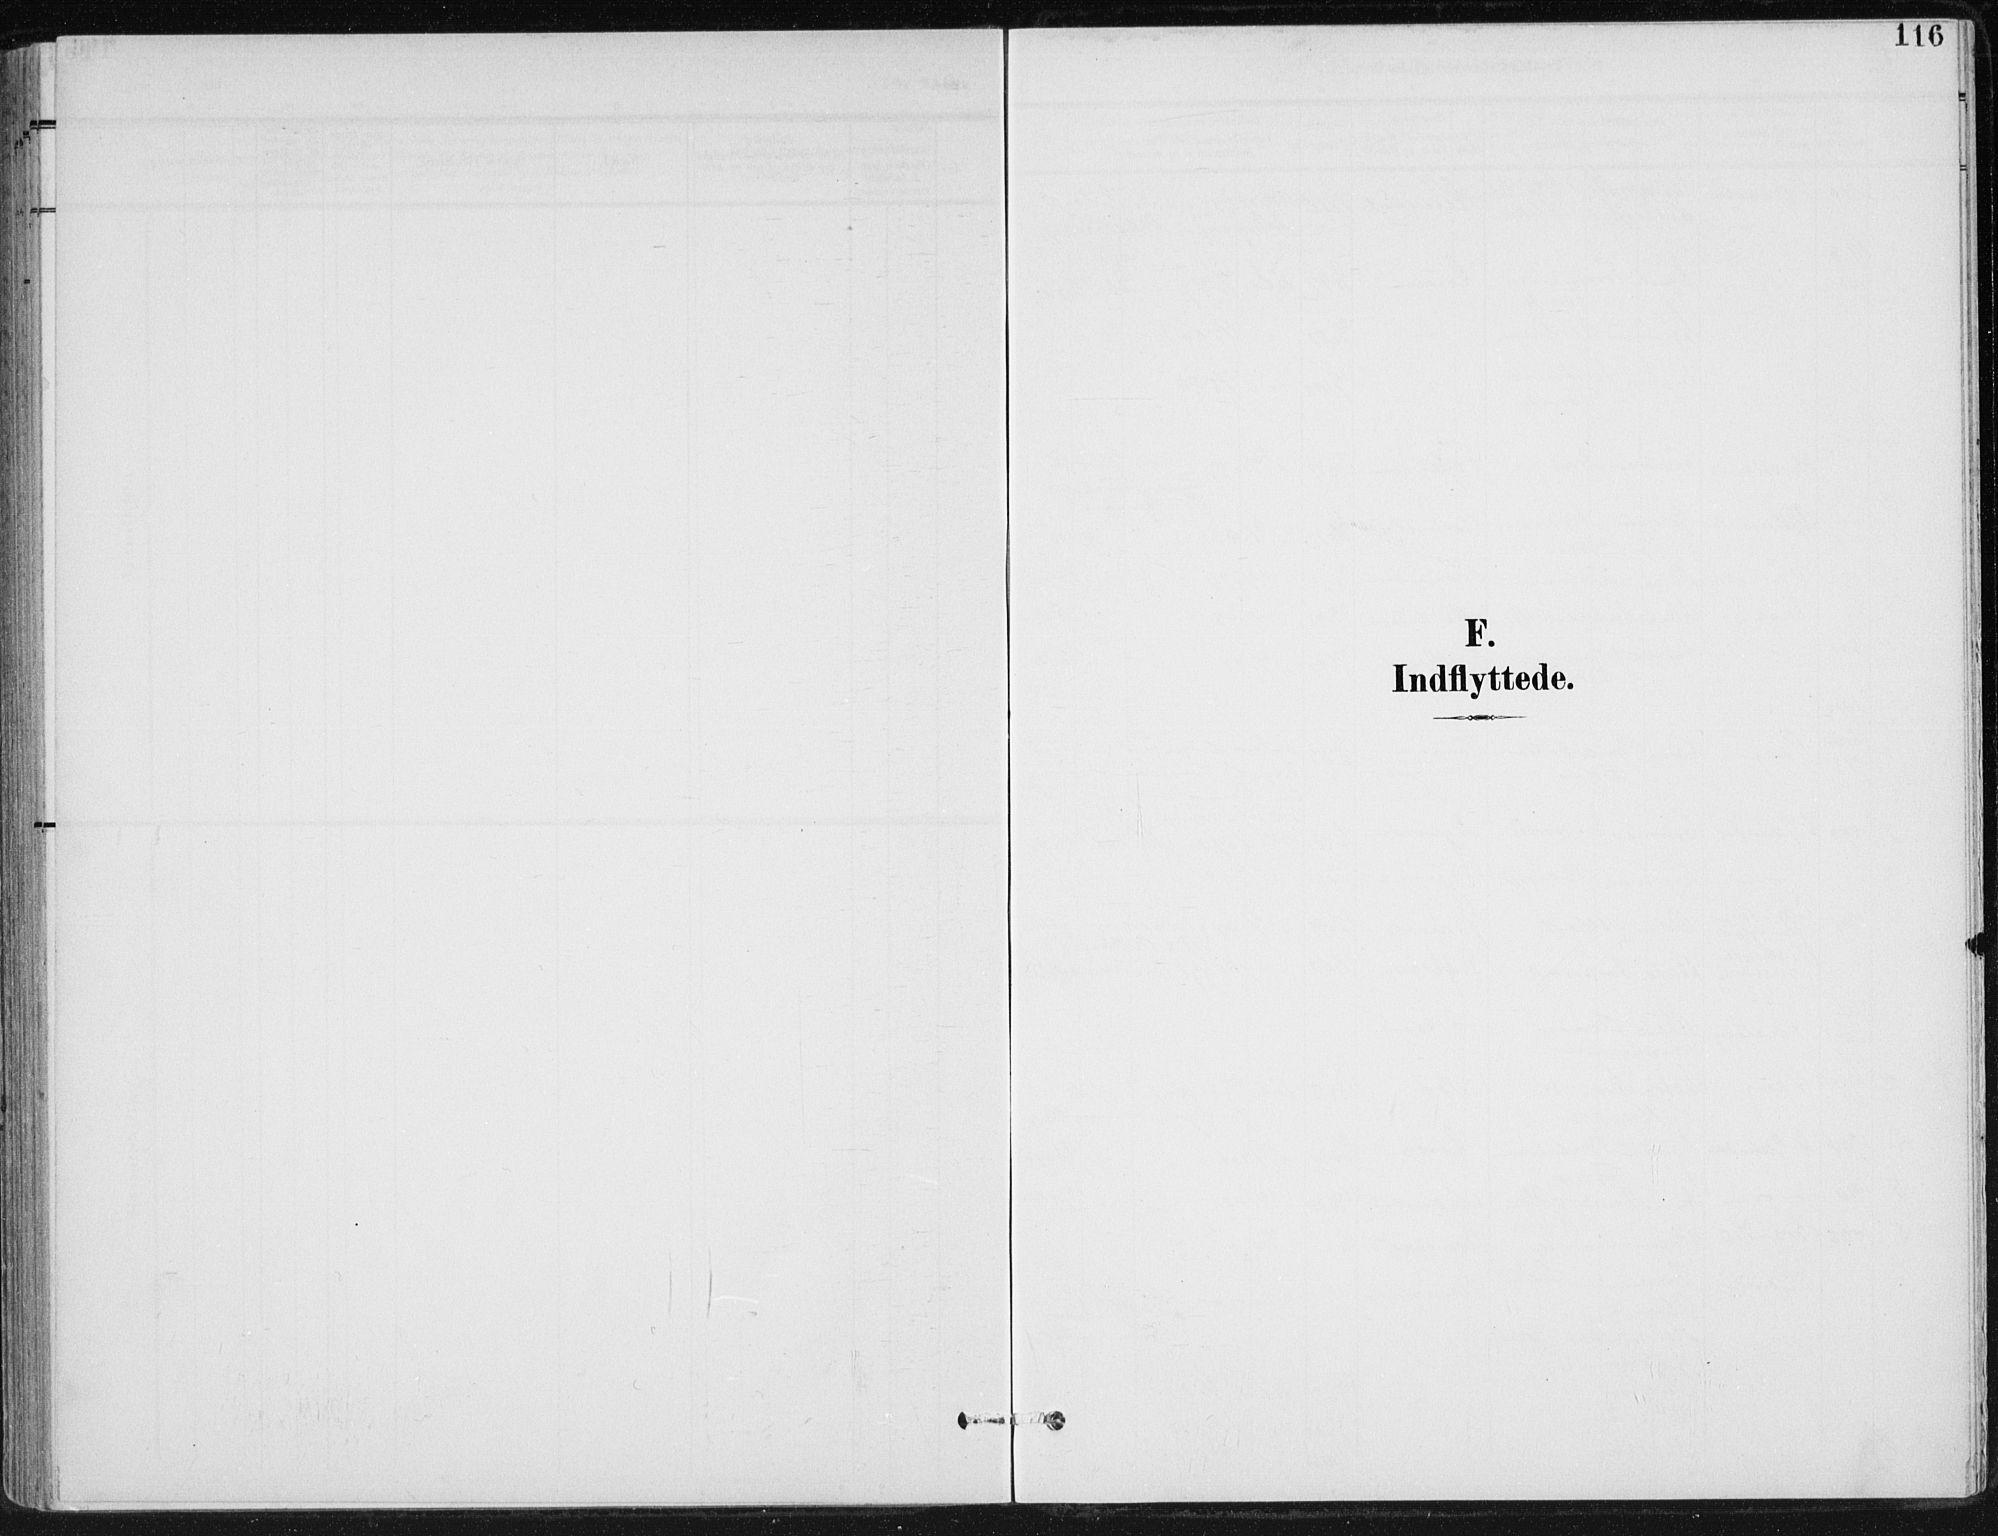 SAH, Østre Gausdal prestekontor, Ministerialbok nr. 5, 1902-1920, s. 116